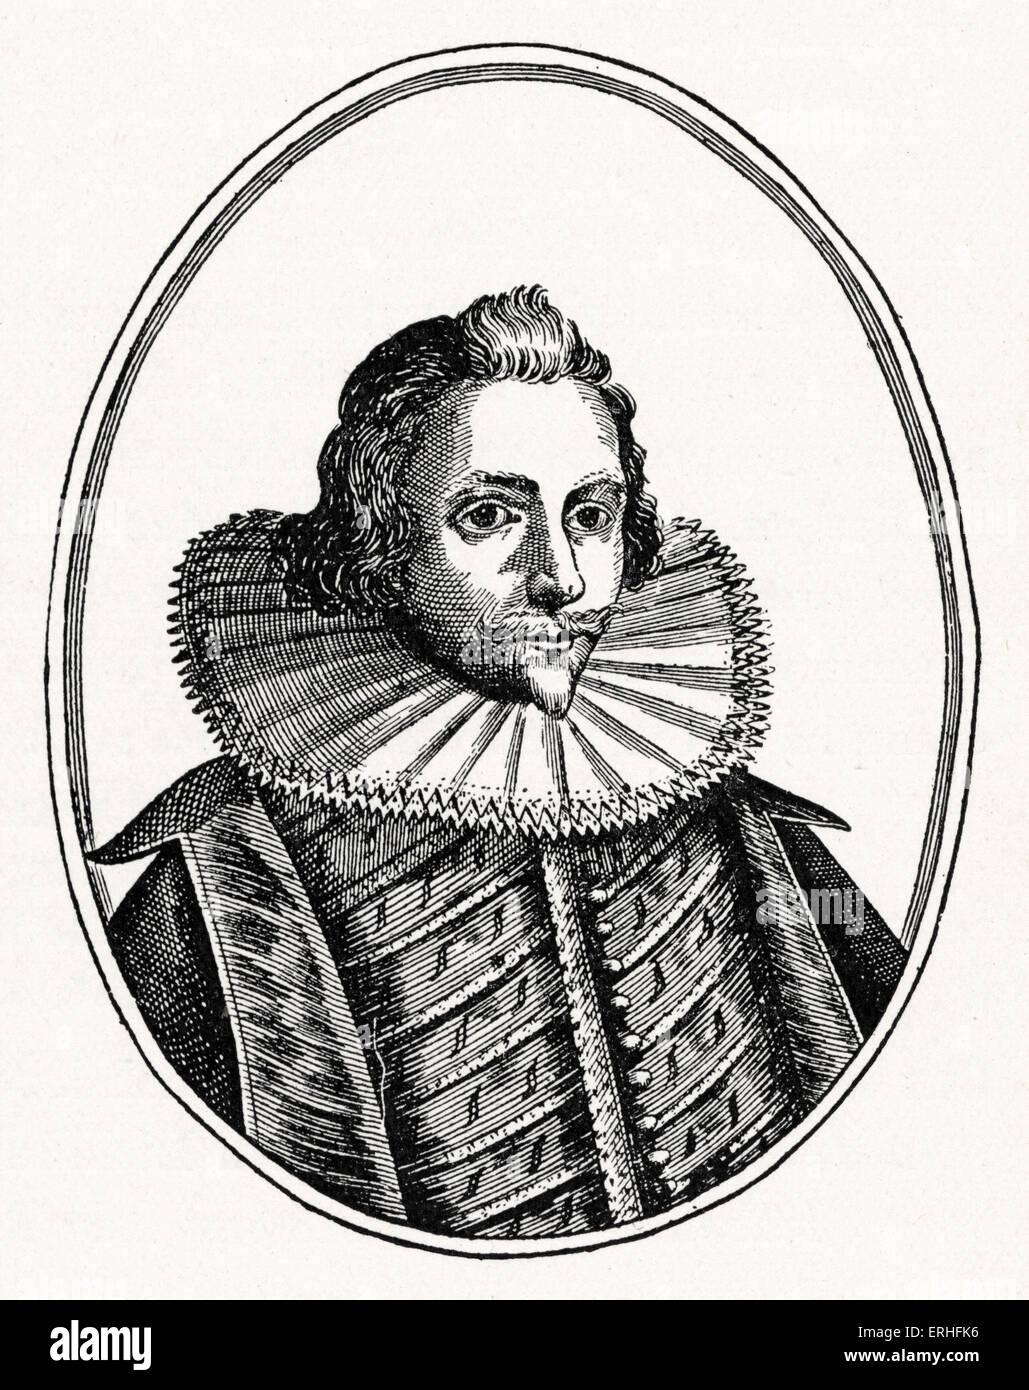 Sir Philip Sidney - portrait - English poet and sonnet writer - 30 November 1554 - 17 October 1586 - Stock Image